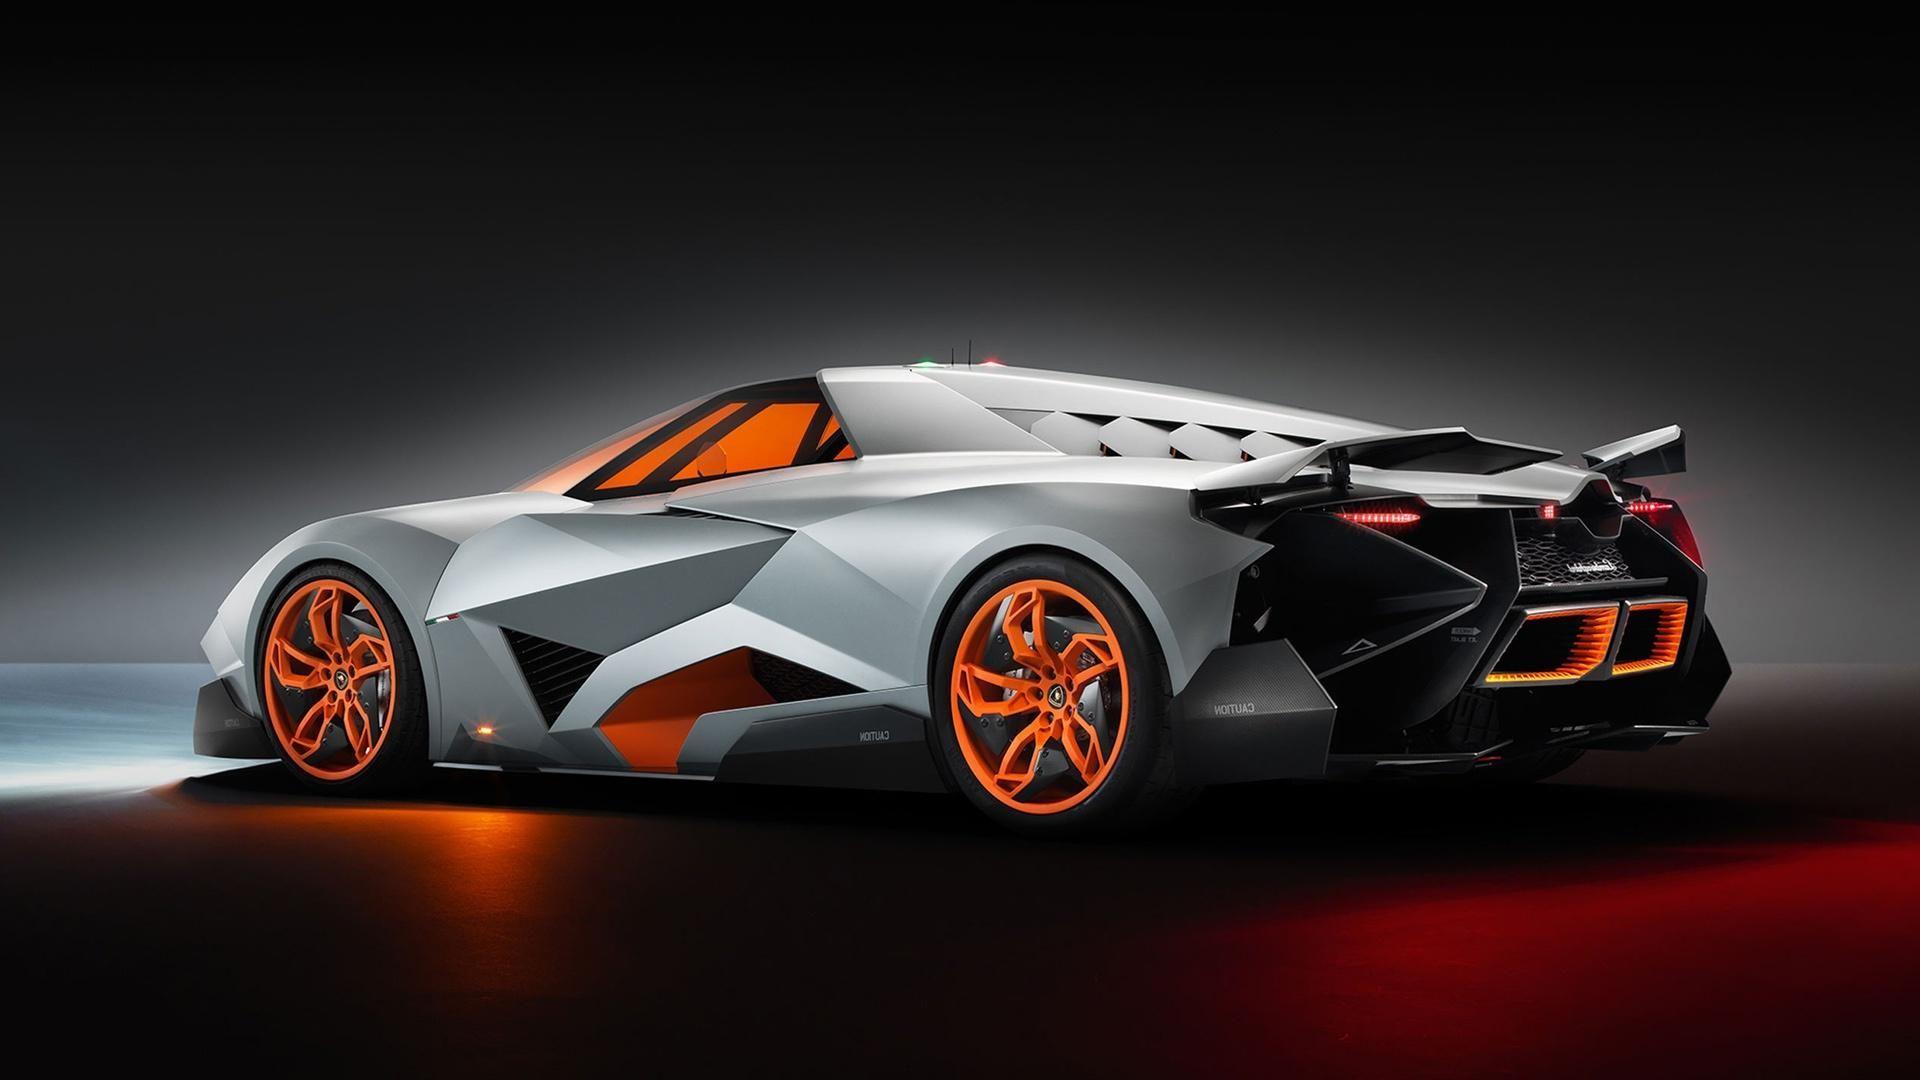 Lamborghini Egoista Wallpapers - Wallpaper Cave